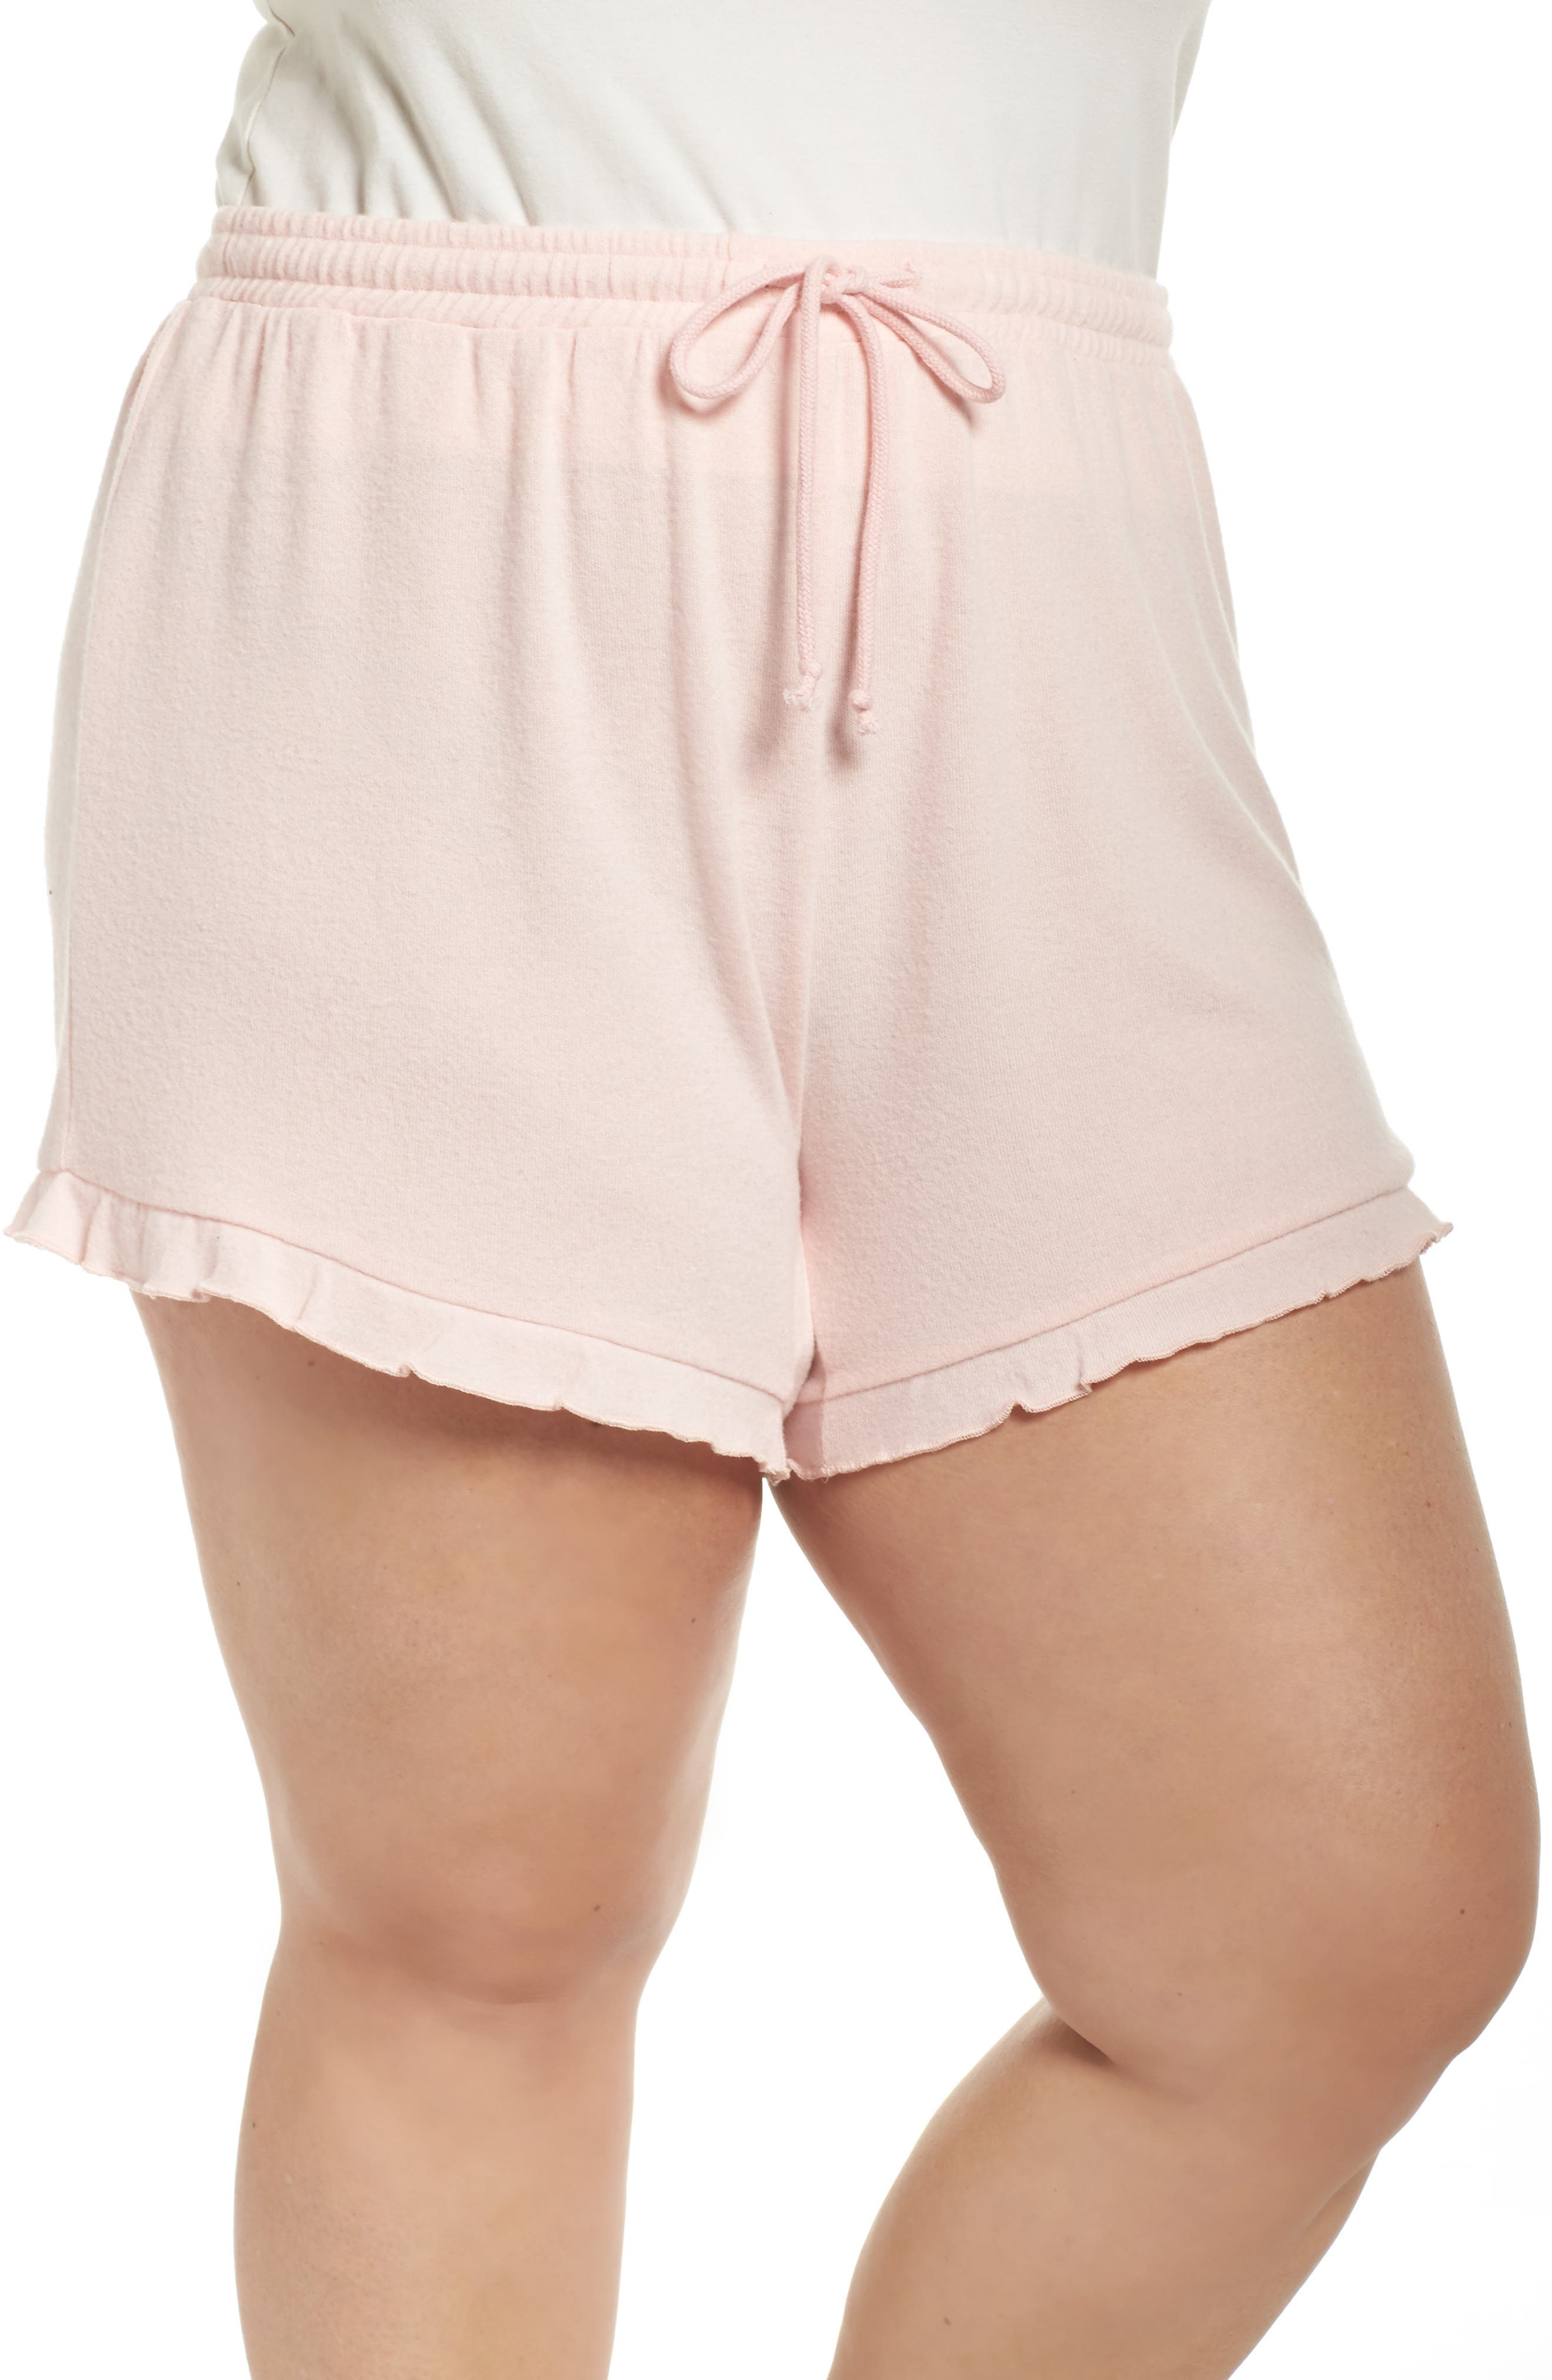 Ruffle Lounge Shorts,                             Main thumbnail 1, color,                             Blush